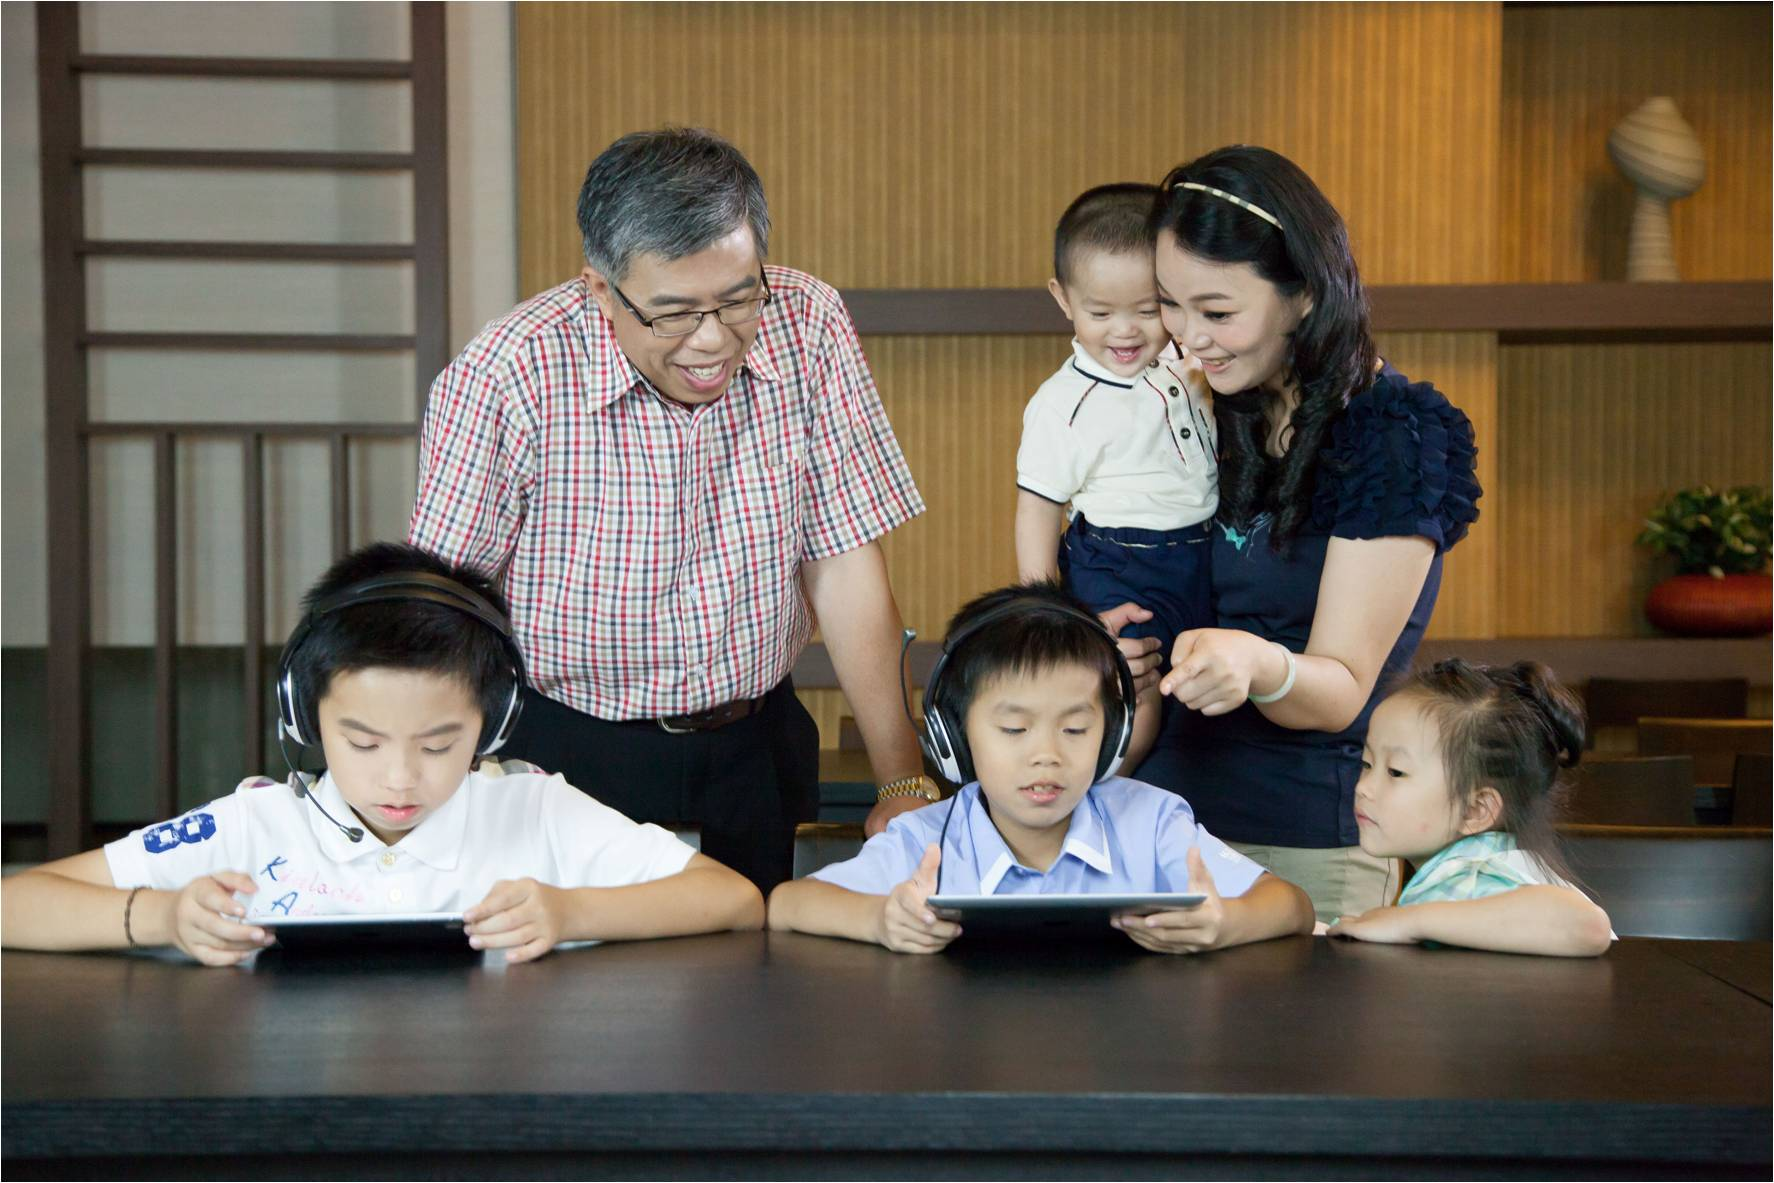 TutorABCJr新式教學系統 讓英語學習簡單又輕鬆